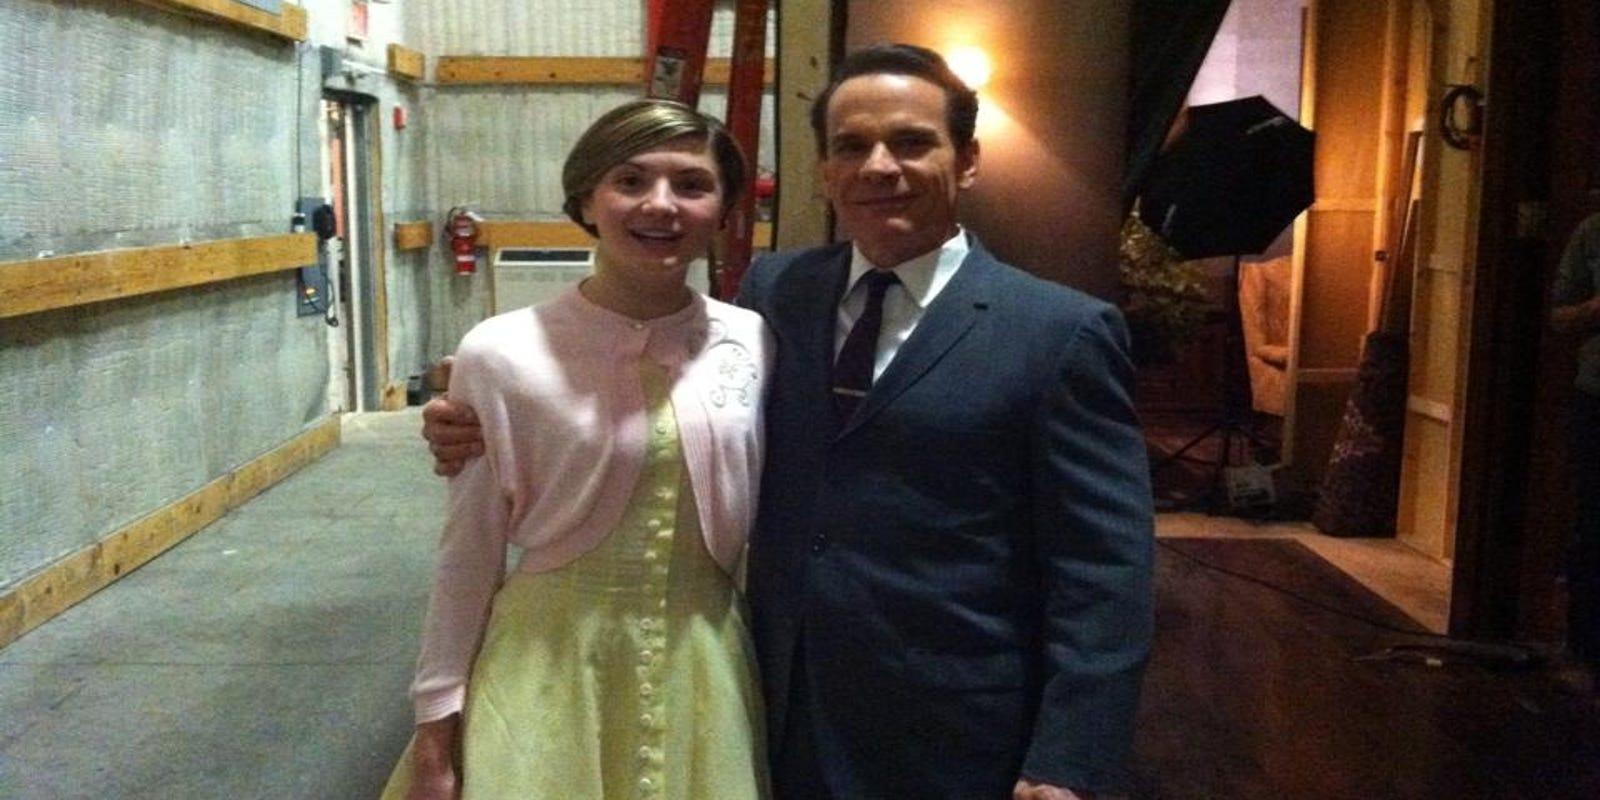 Alyssa Ruland elmira girl to appear in 'gotham'